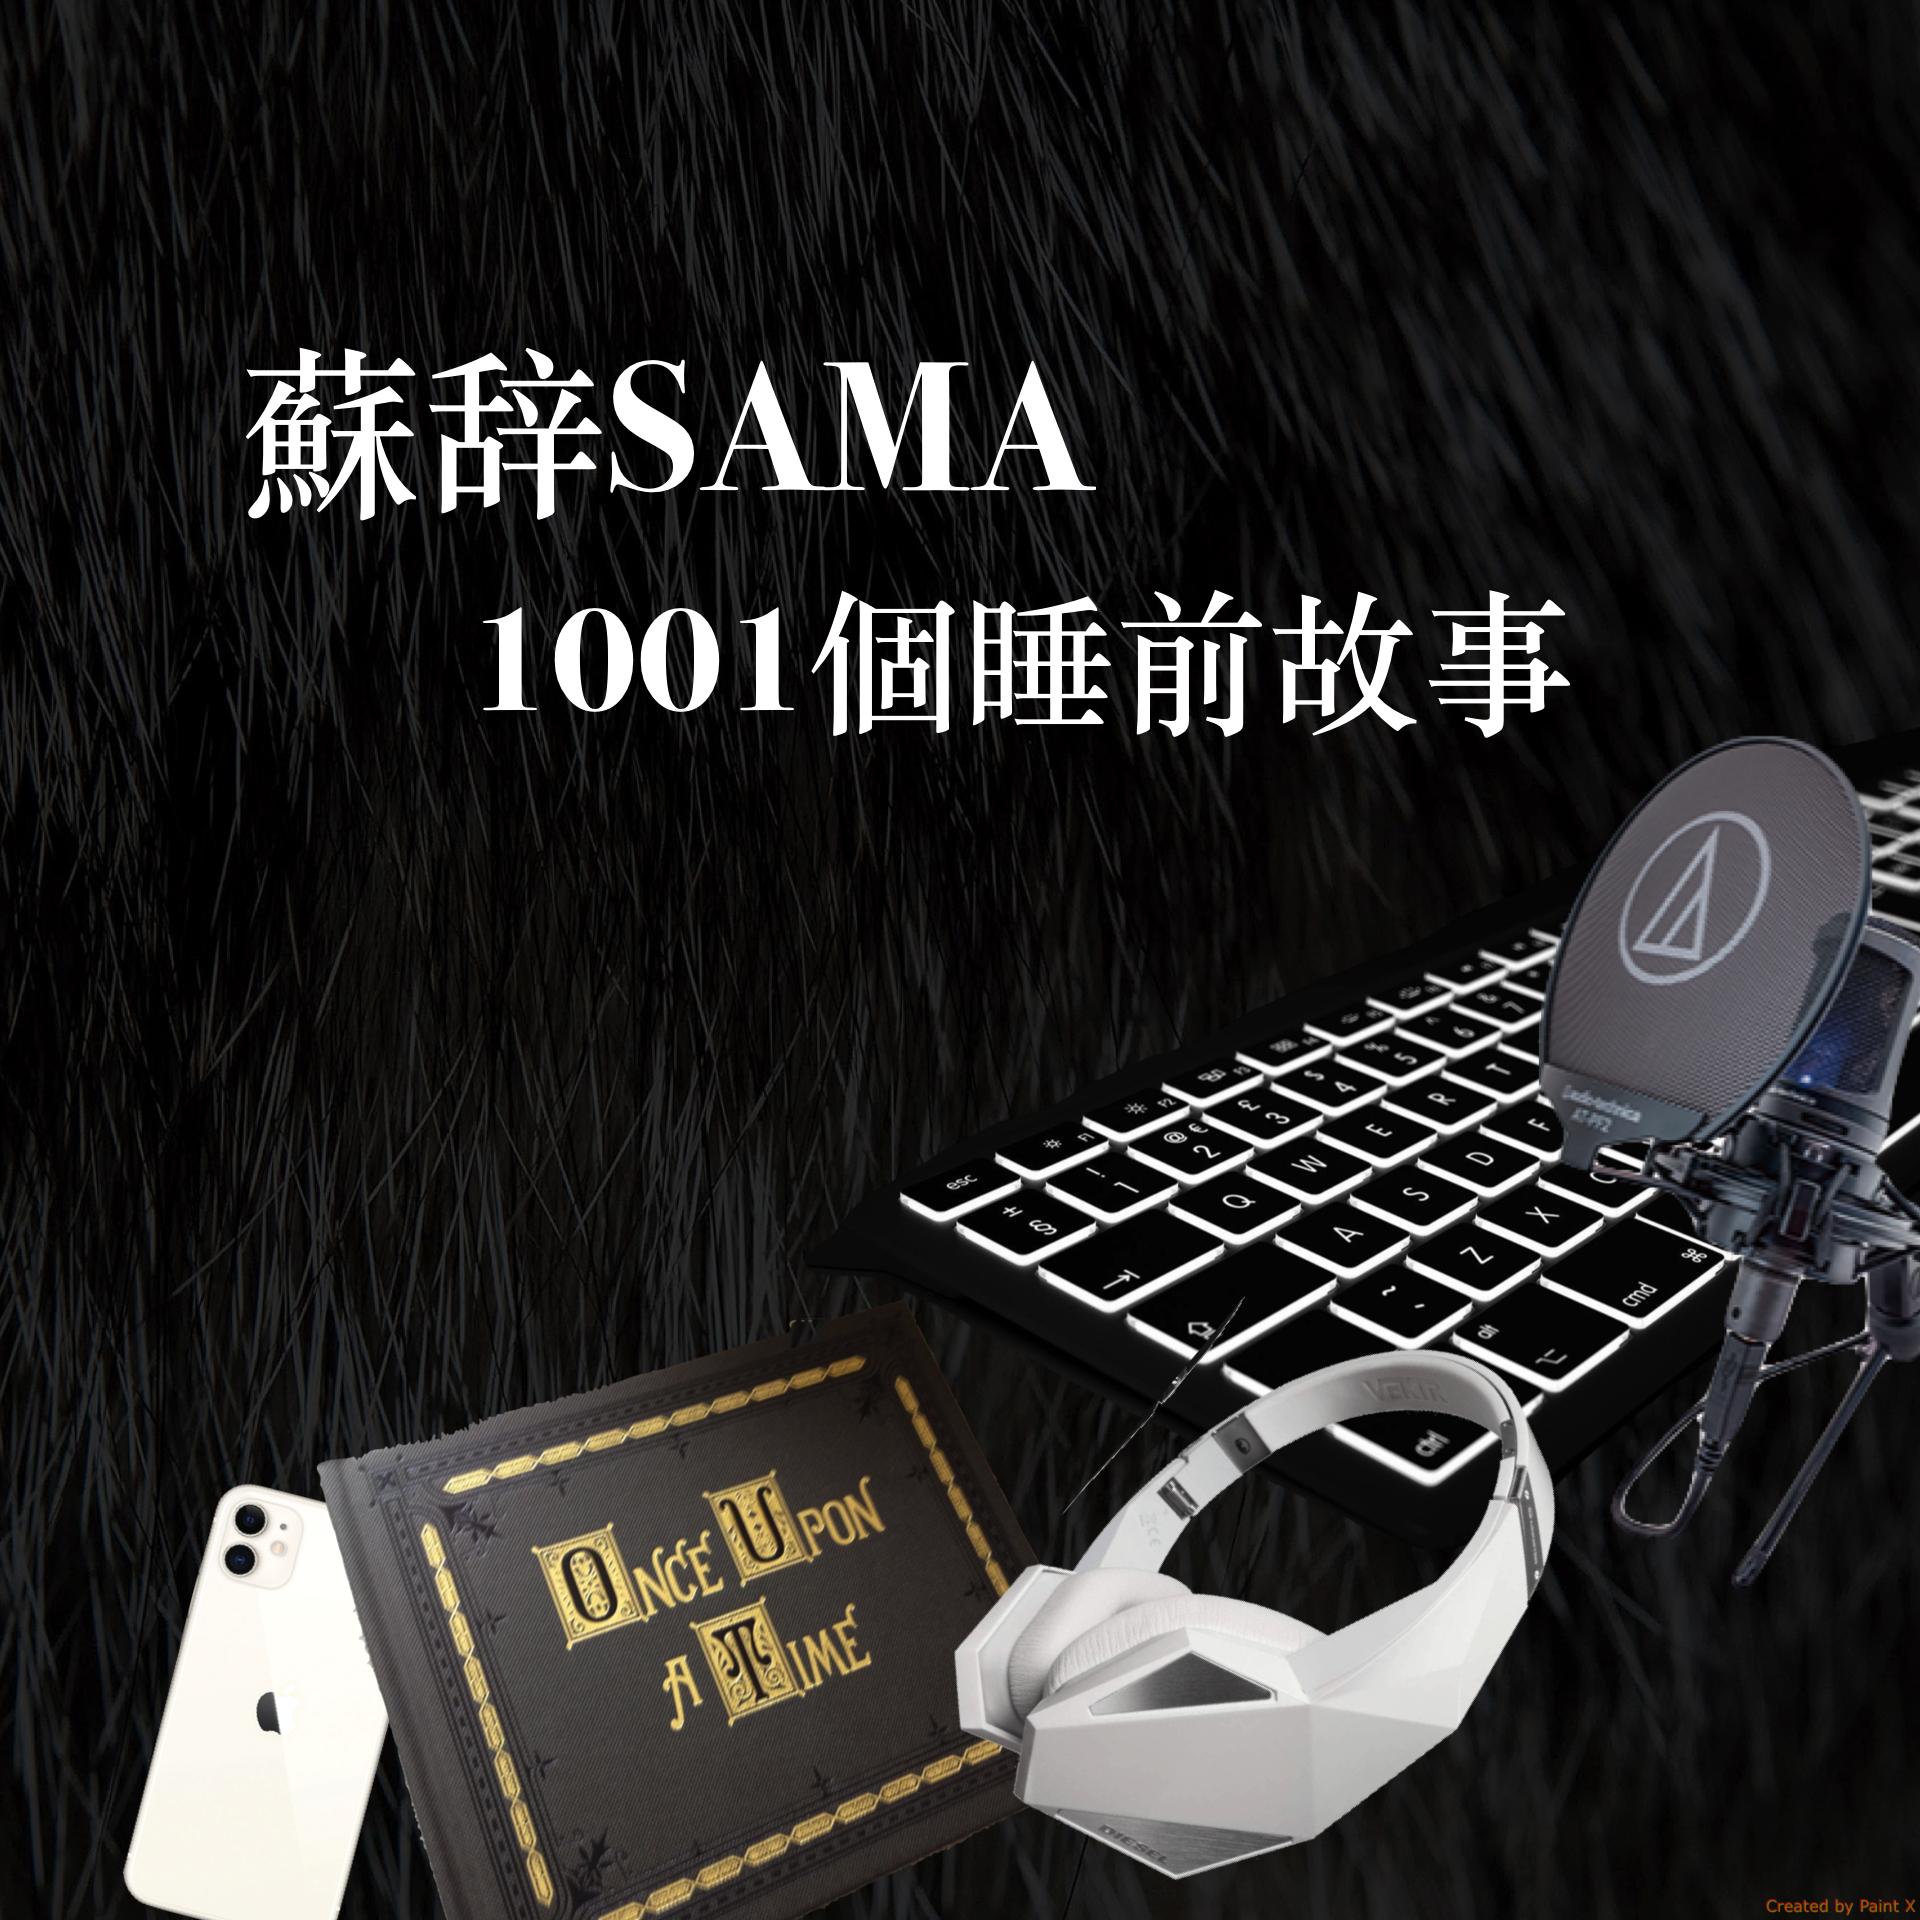 蘇辞SAMA的1001夜